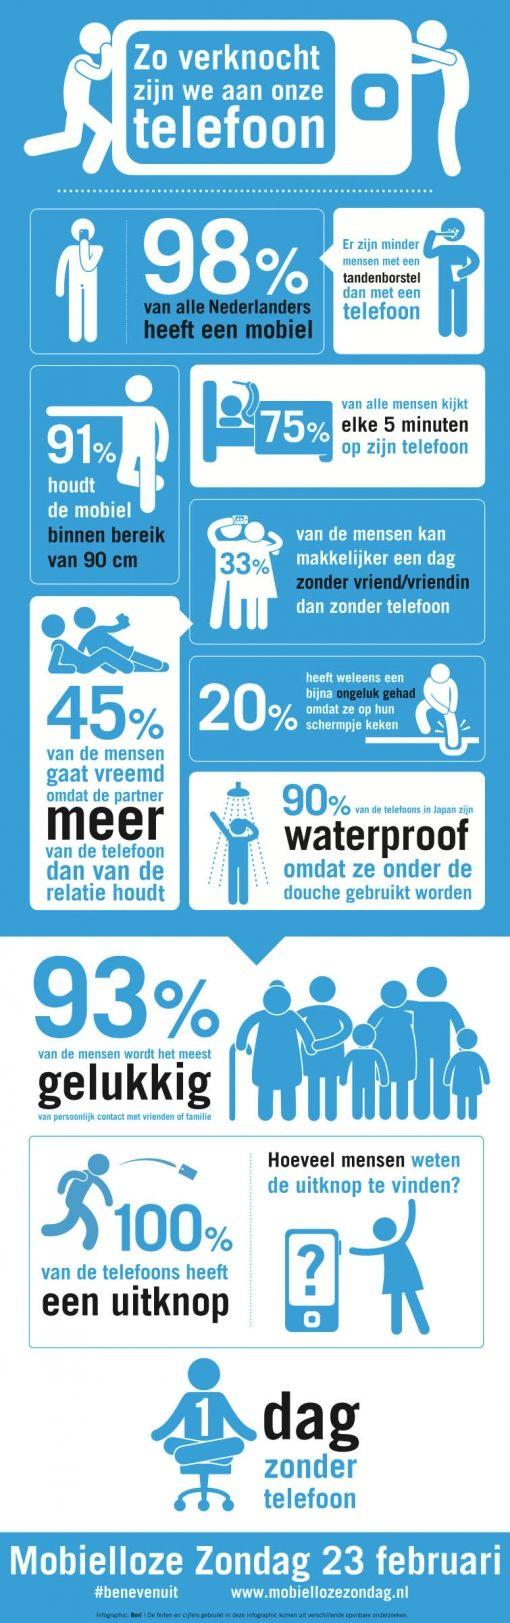 infographic-mobielloze-zondag